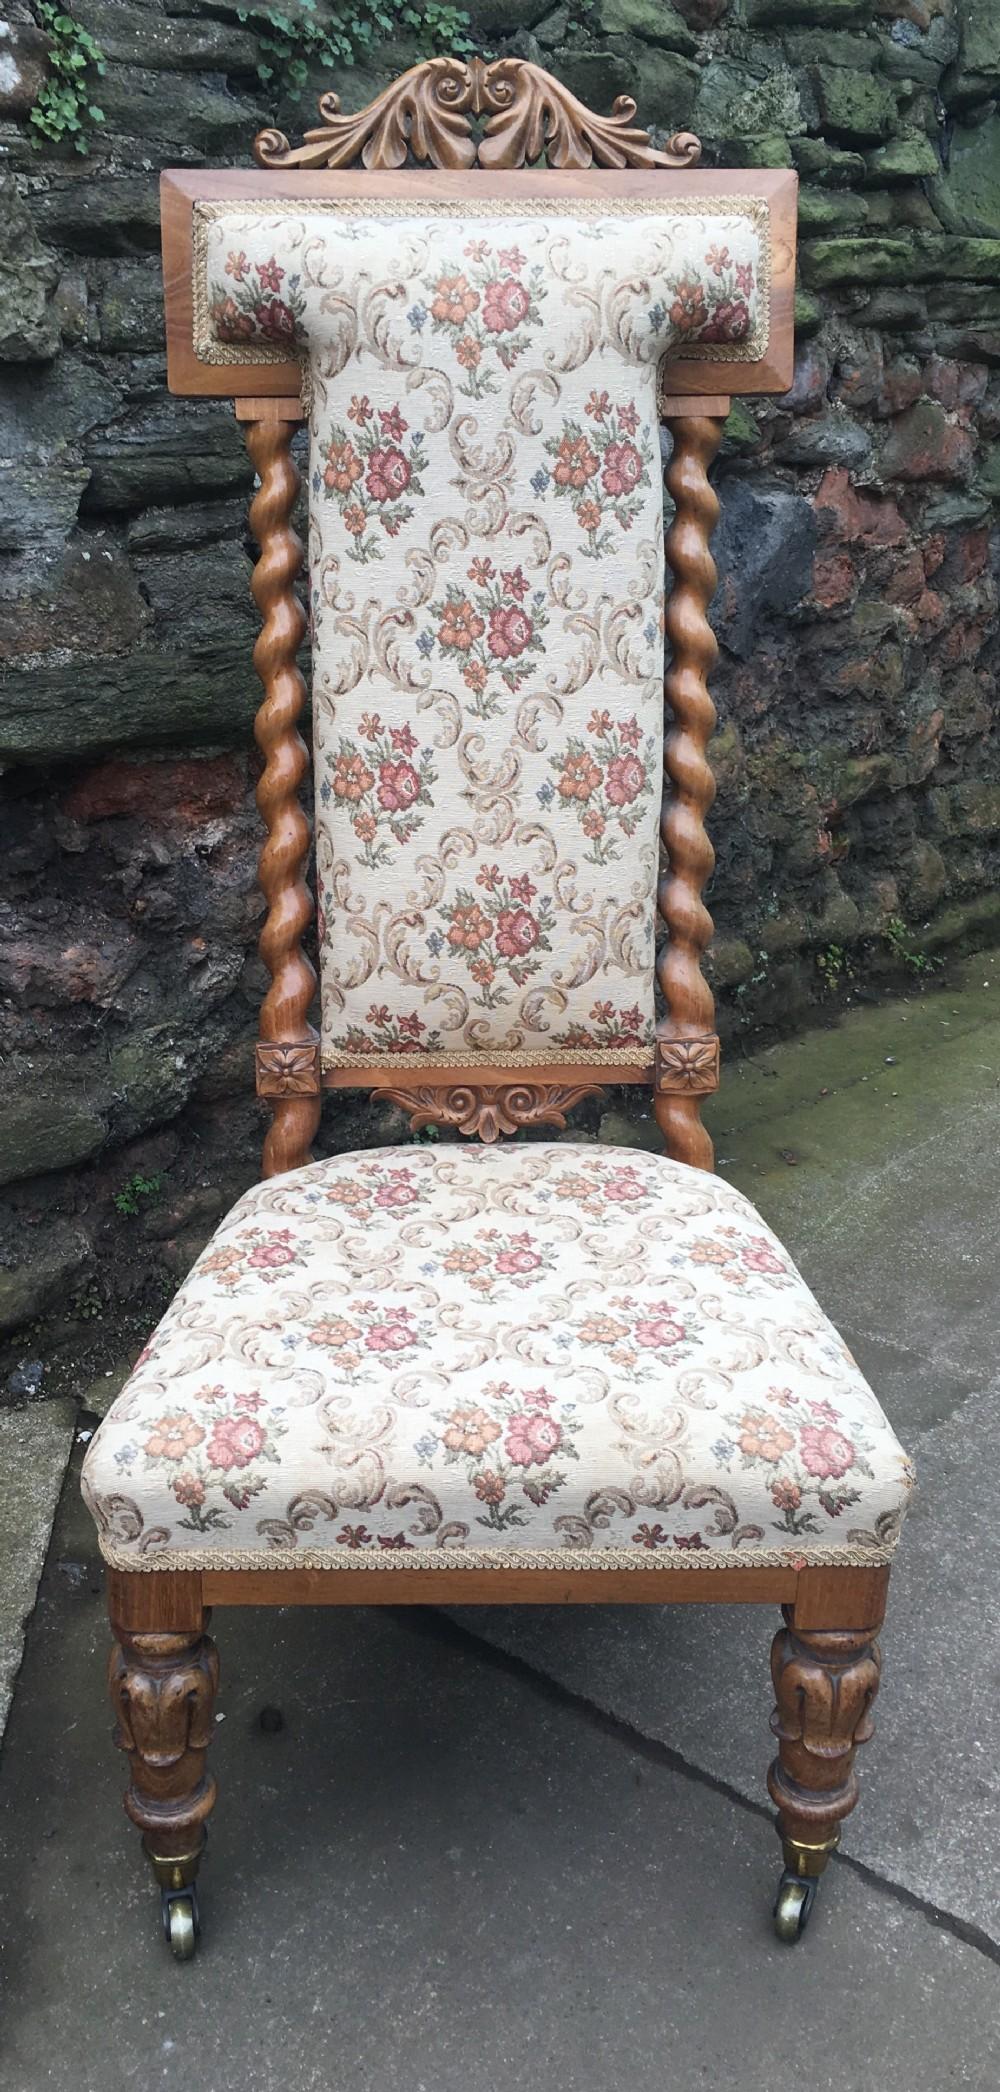 c19th ash wood nursing chair or priedieu